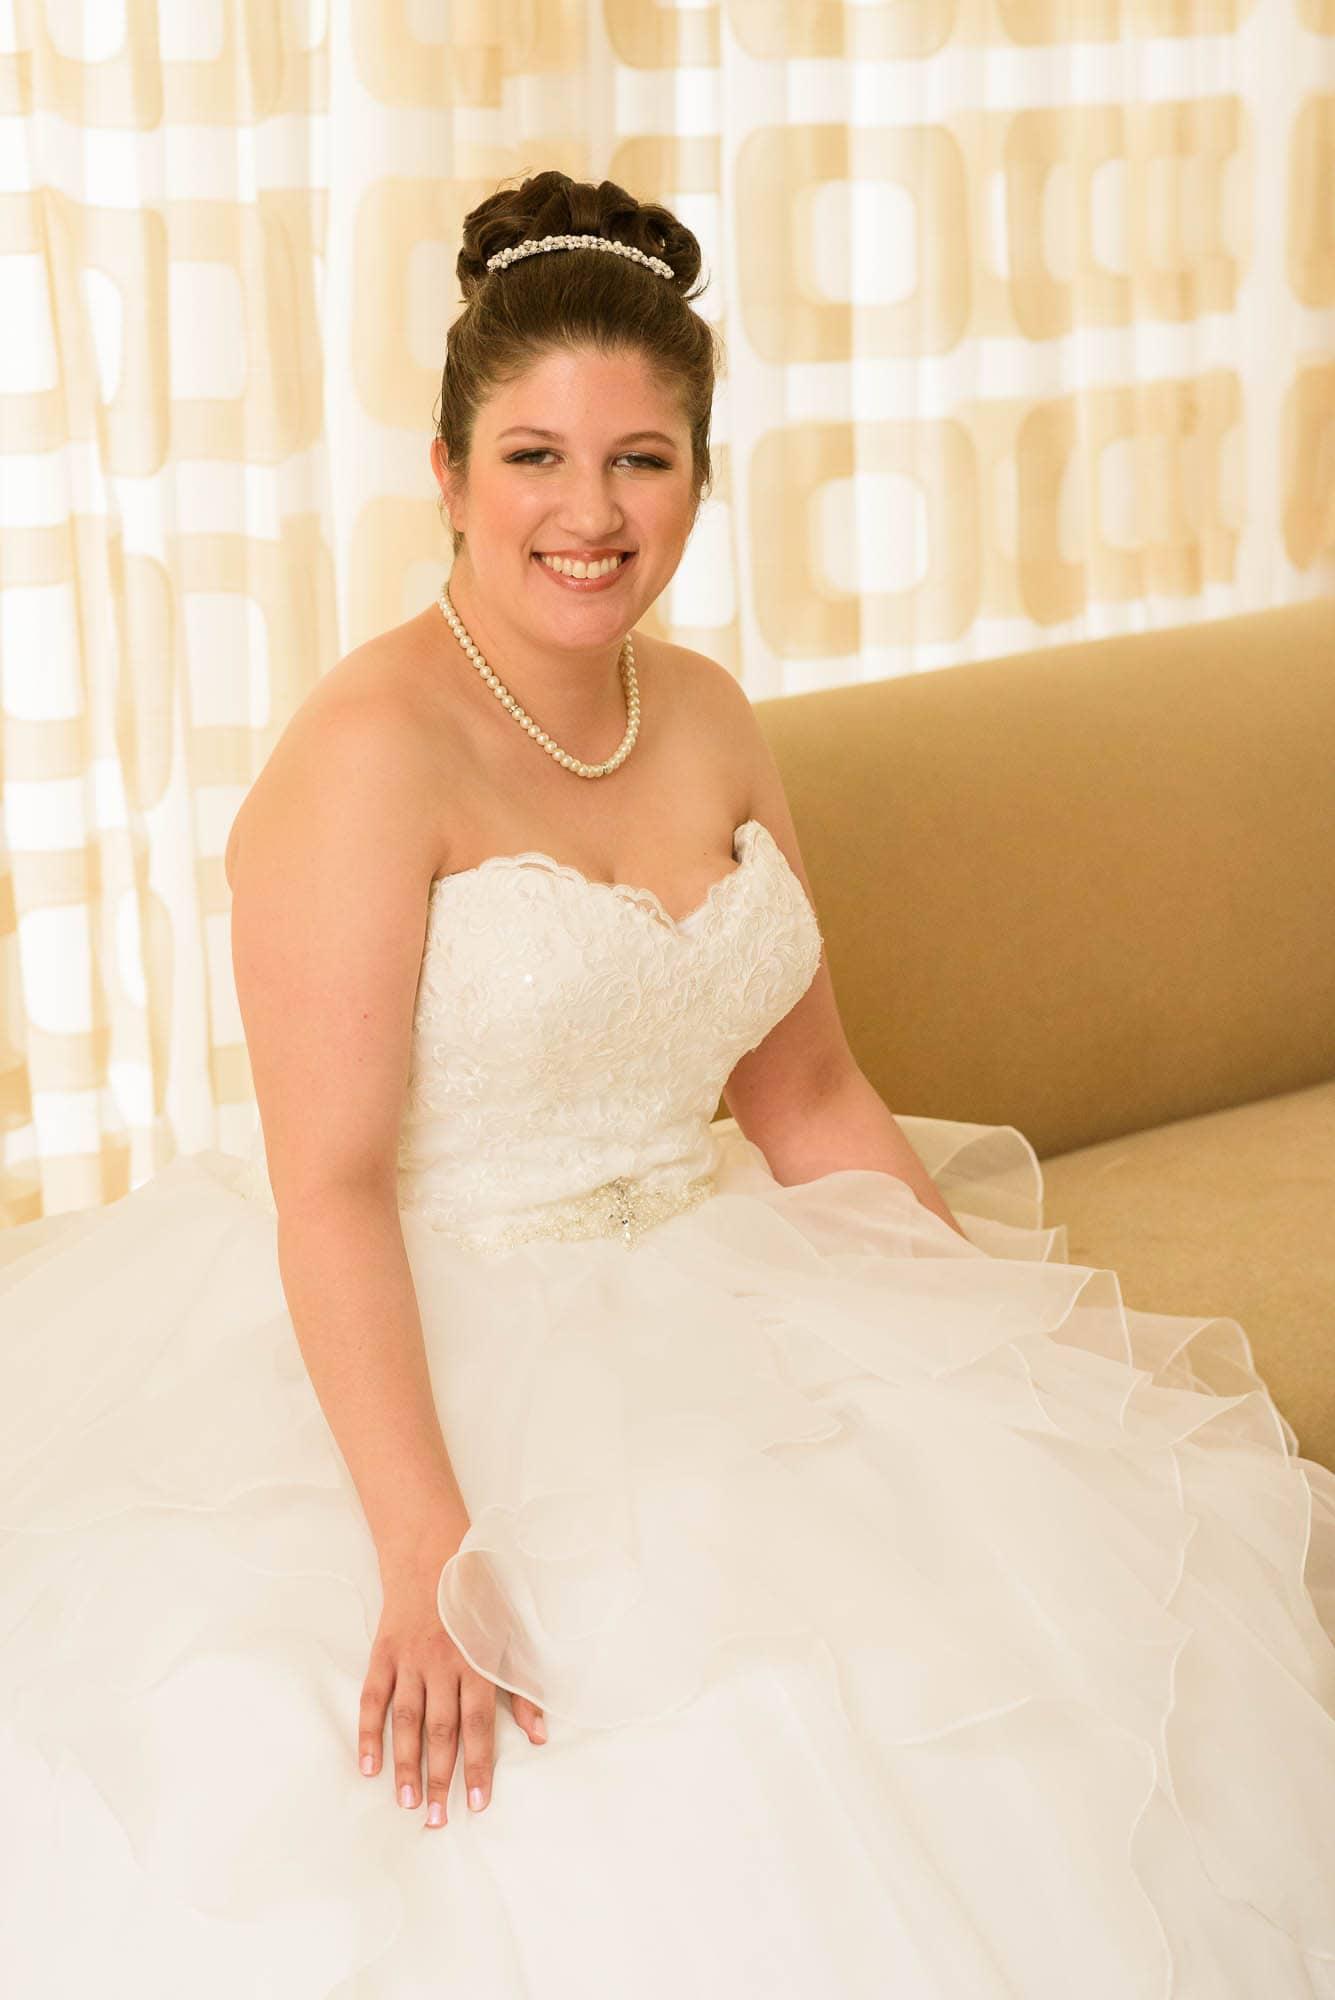 006_Alan_and_Heidi_Wedding_Nicole_Roman